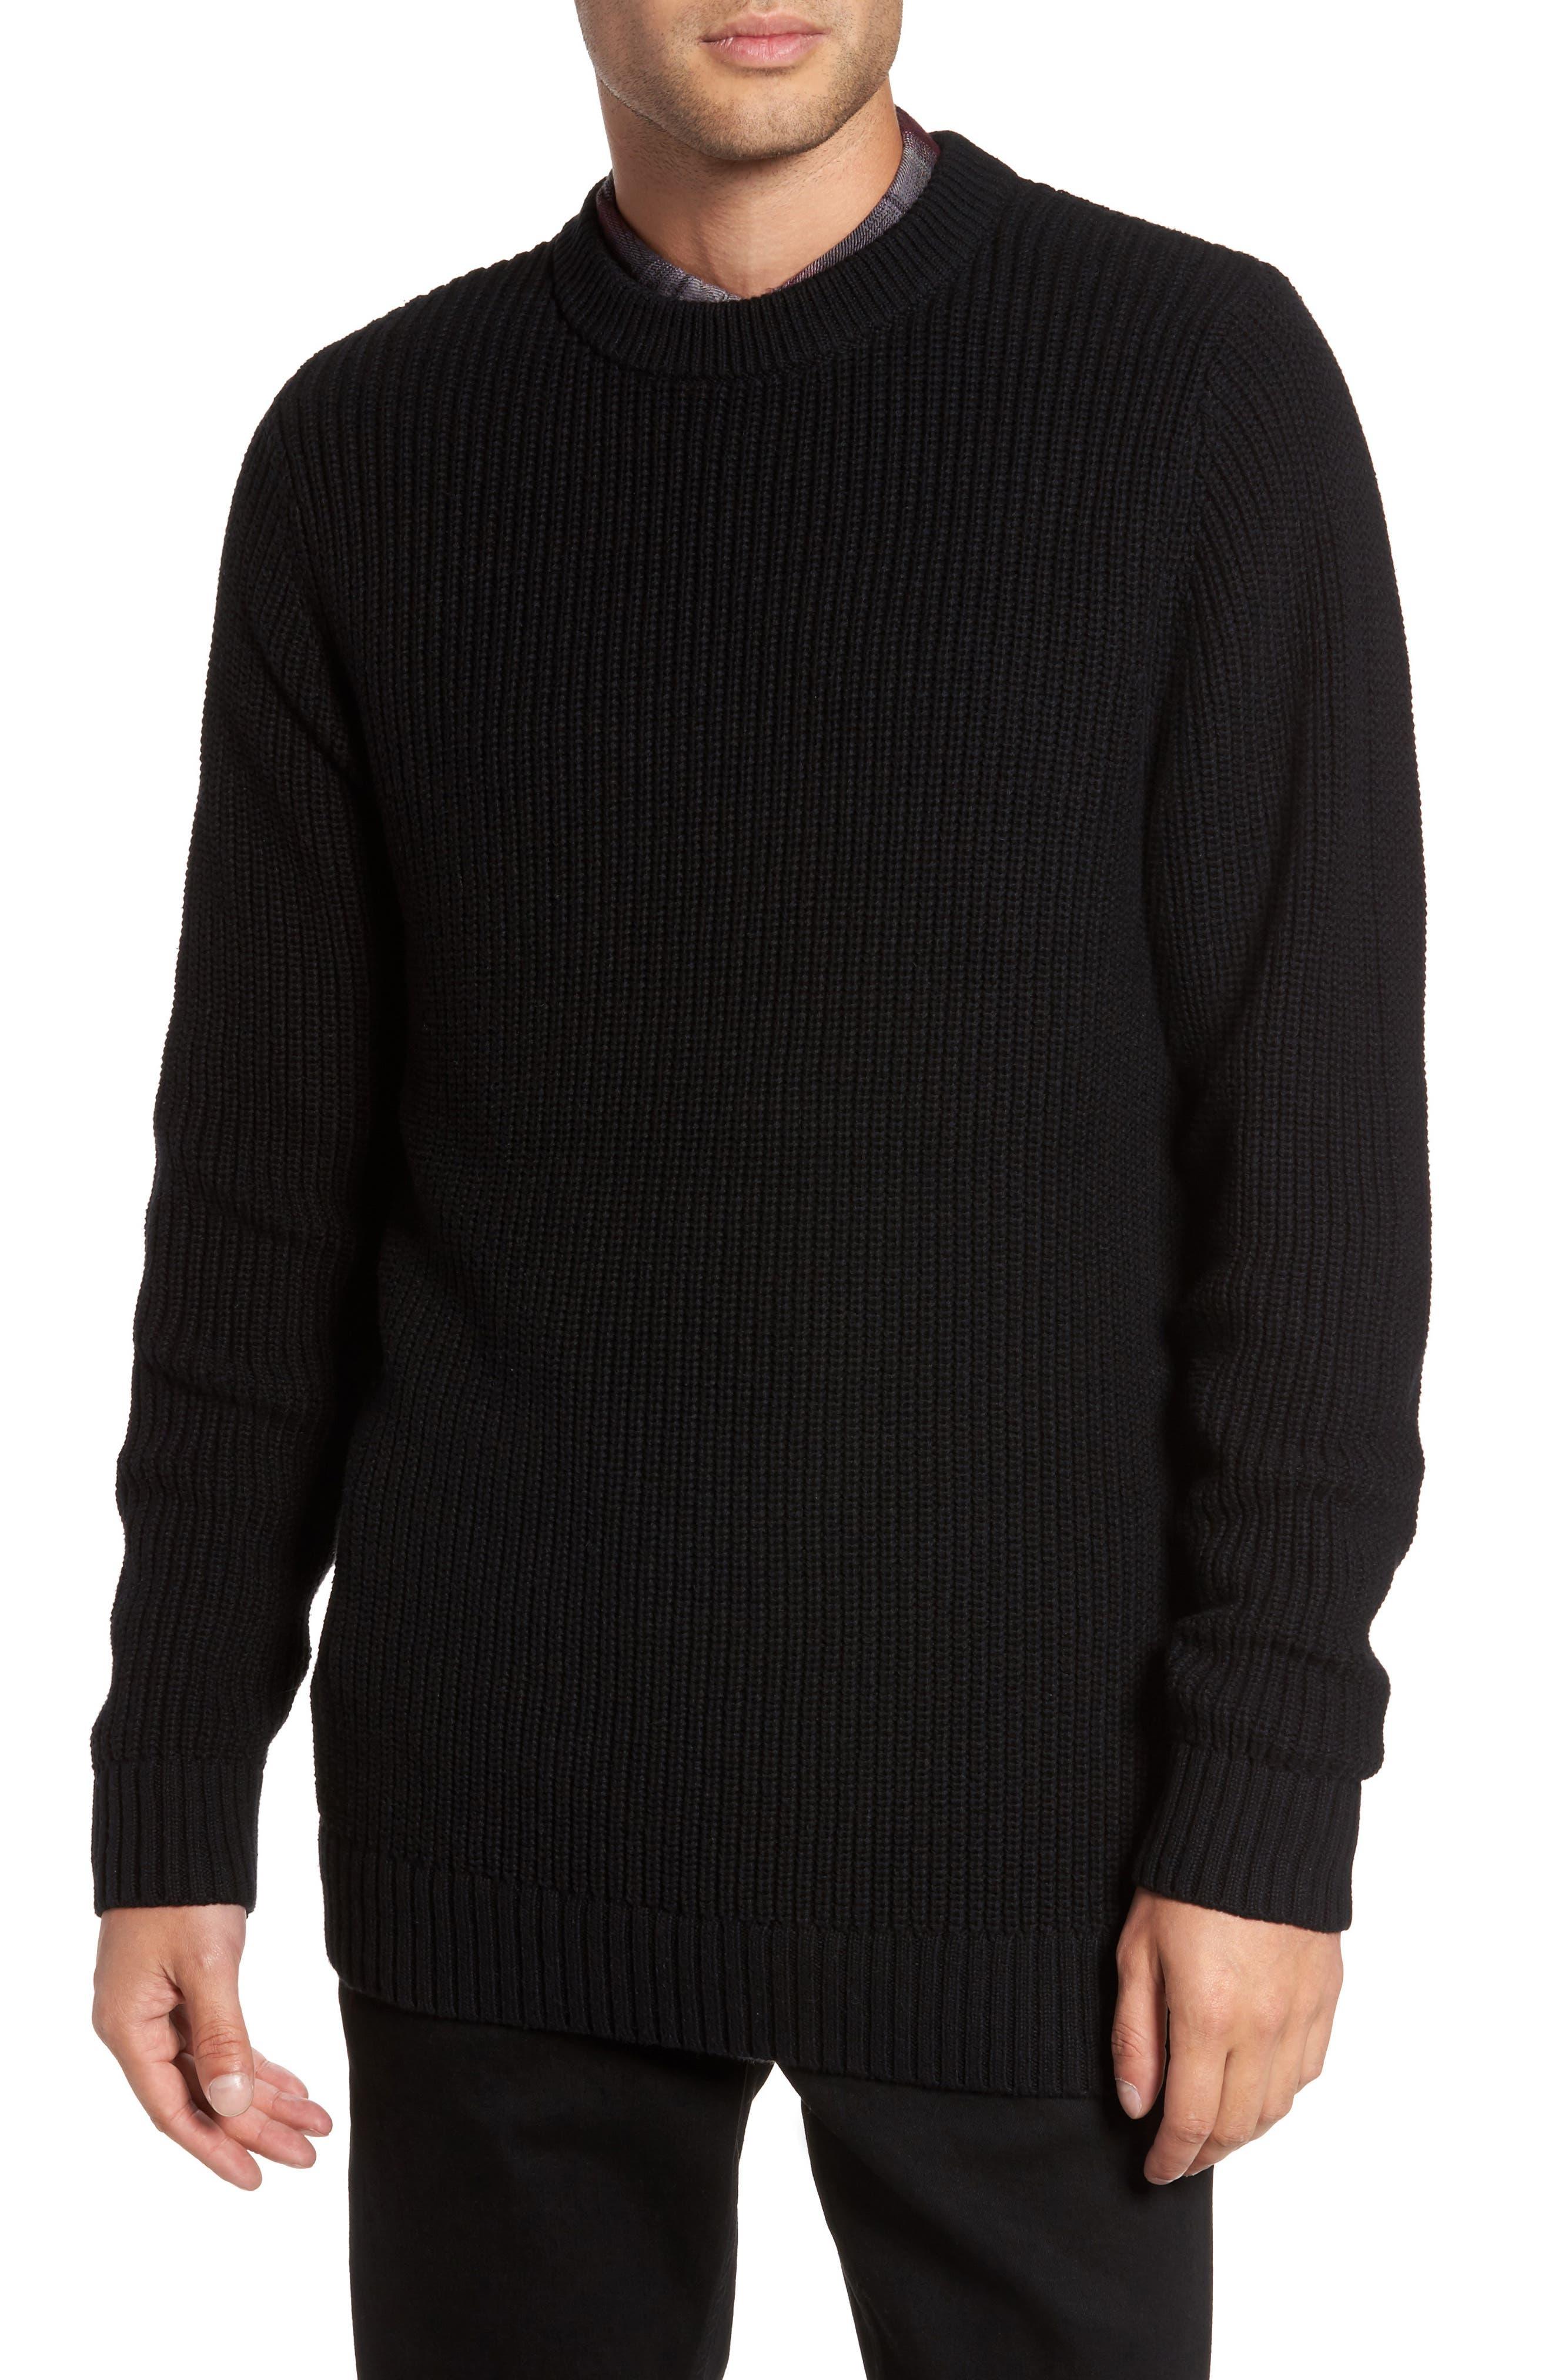 Main Image - Treasure & Bond Shaker Stitch Sweater